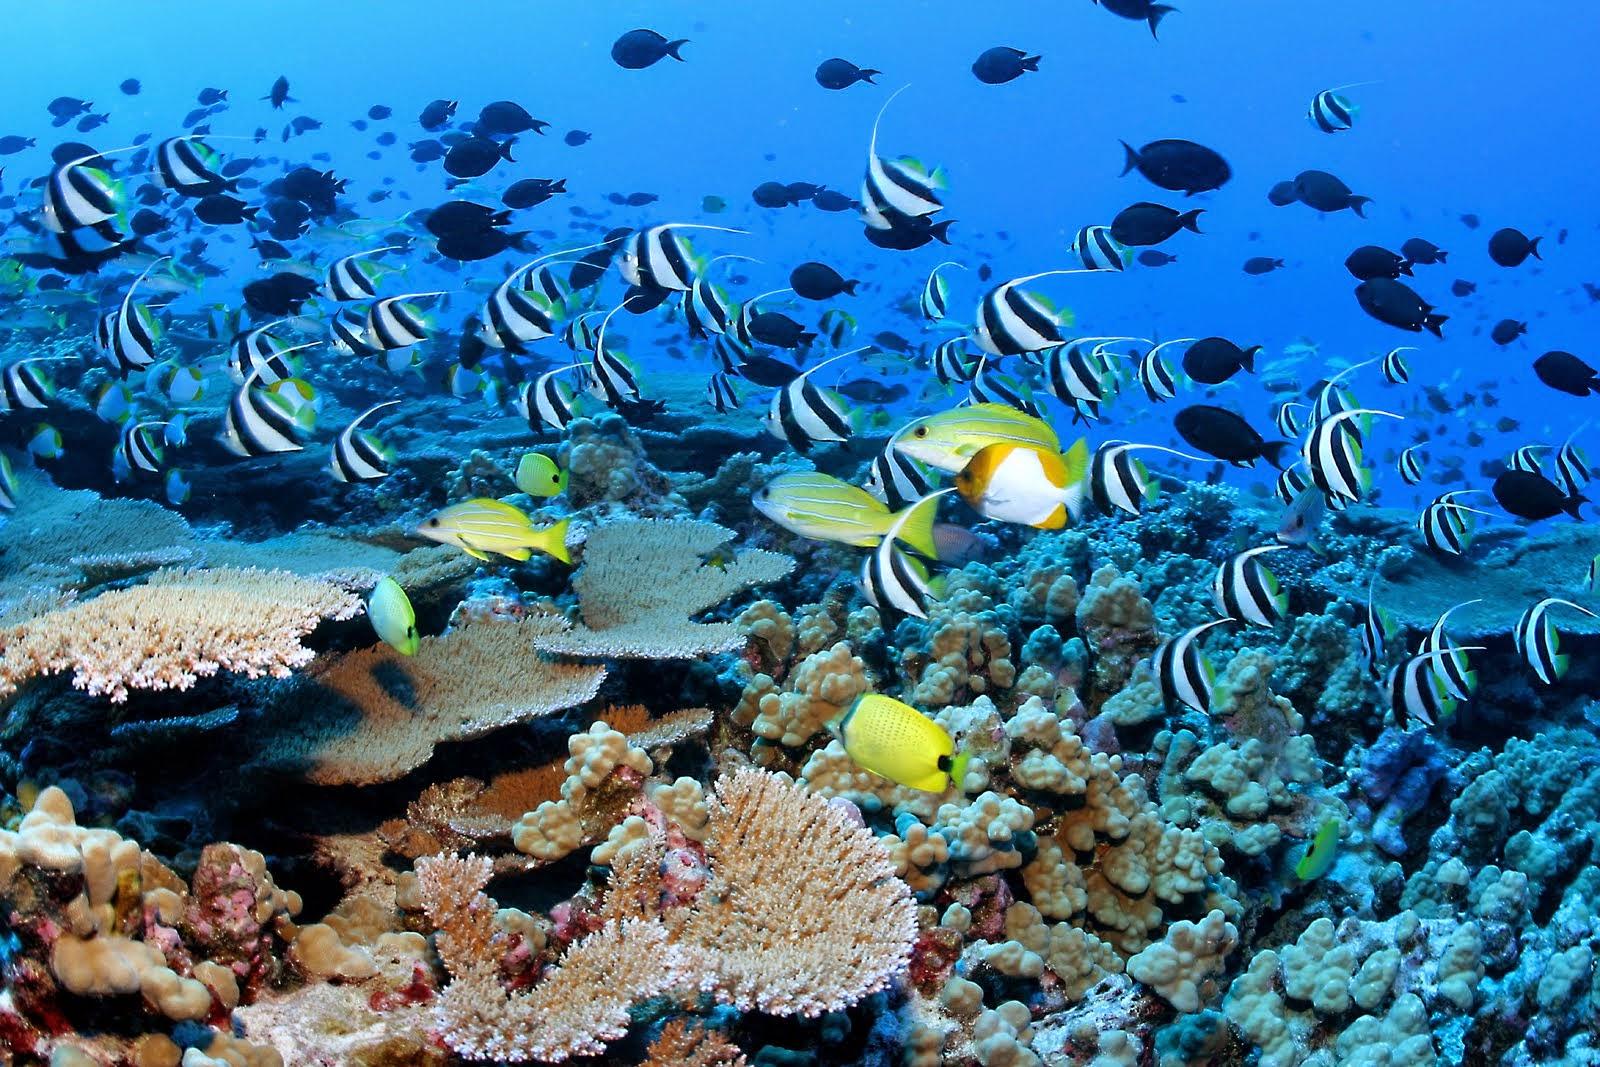 Seberapa Pentingkah Kita Menjaga Laut Dalam ?